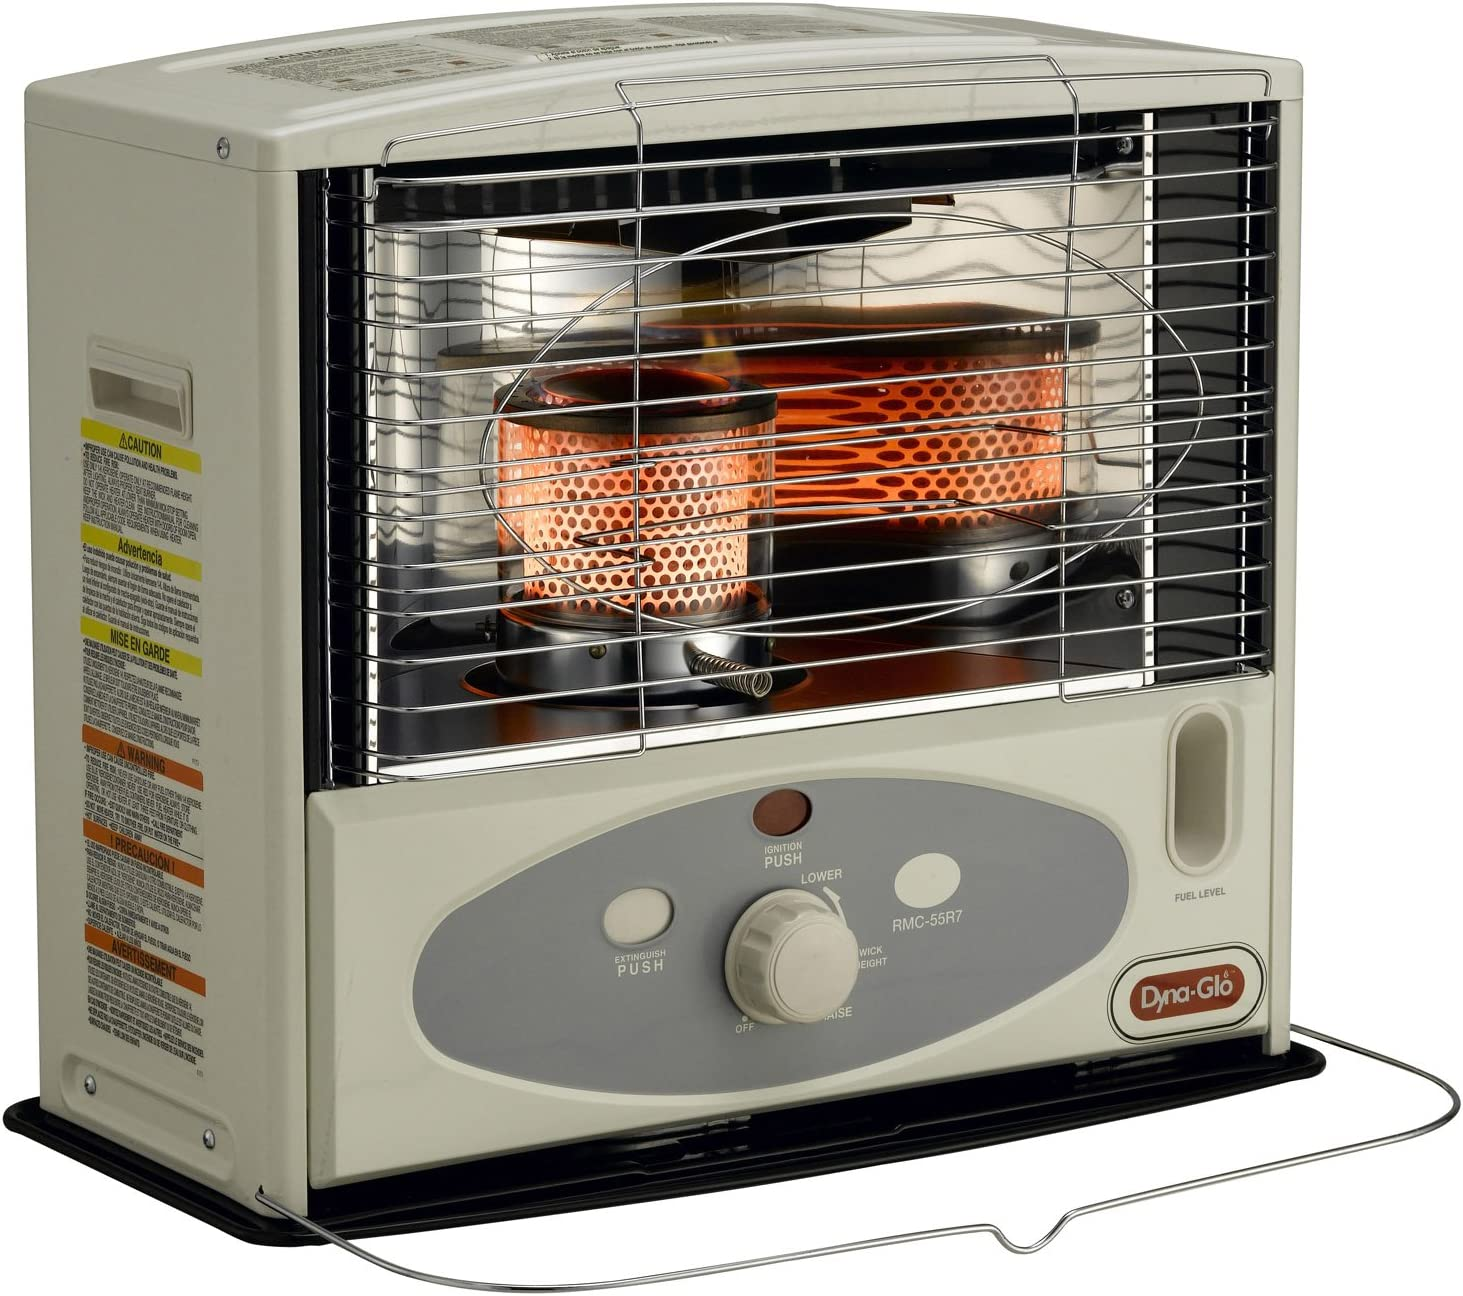 Dyna-Glo RMC-55R7 Indoor Kerosene Radiant National uniform free shipping BTU Ivo 10000 Heater Max 63% OFF